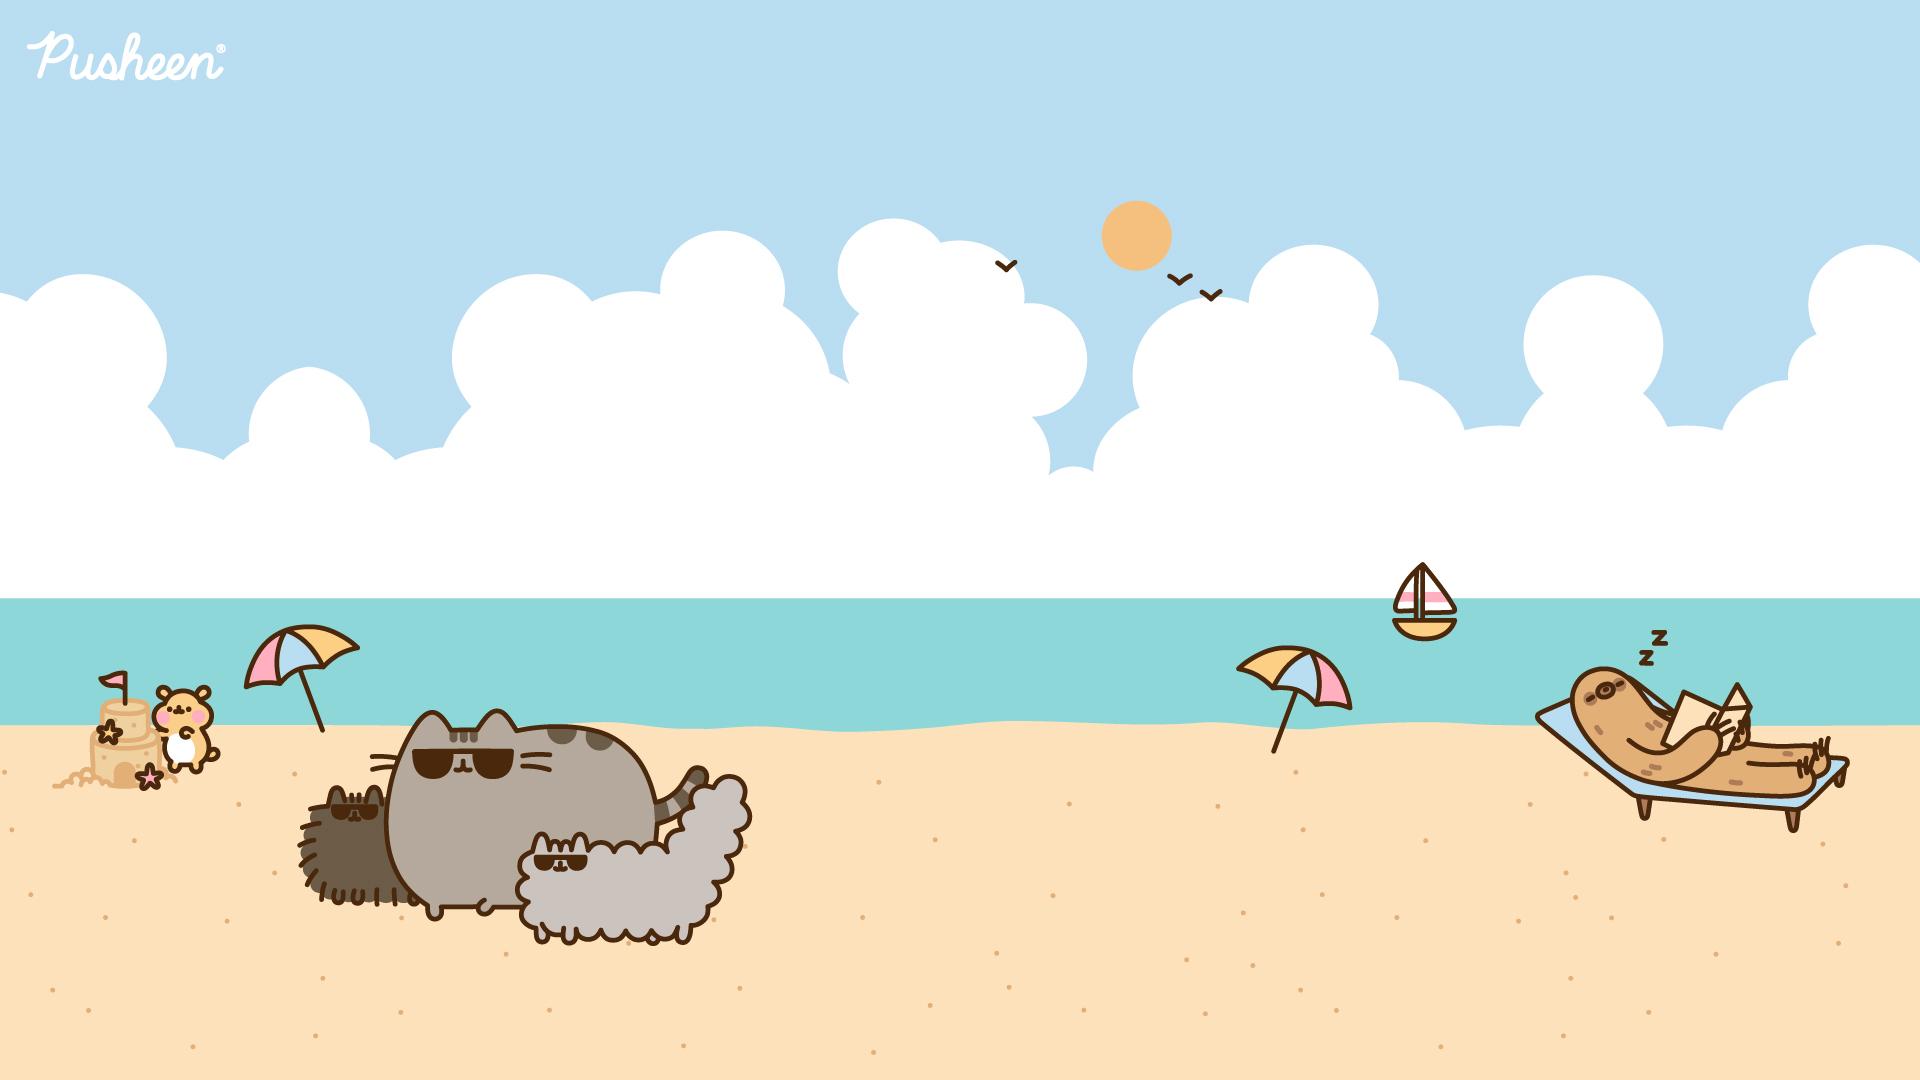 Pusheen_Zoom_Background_Beach_2020